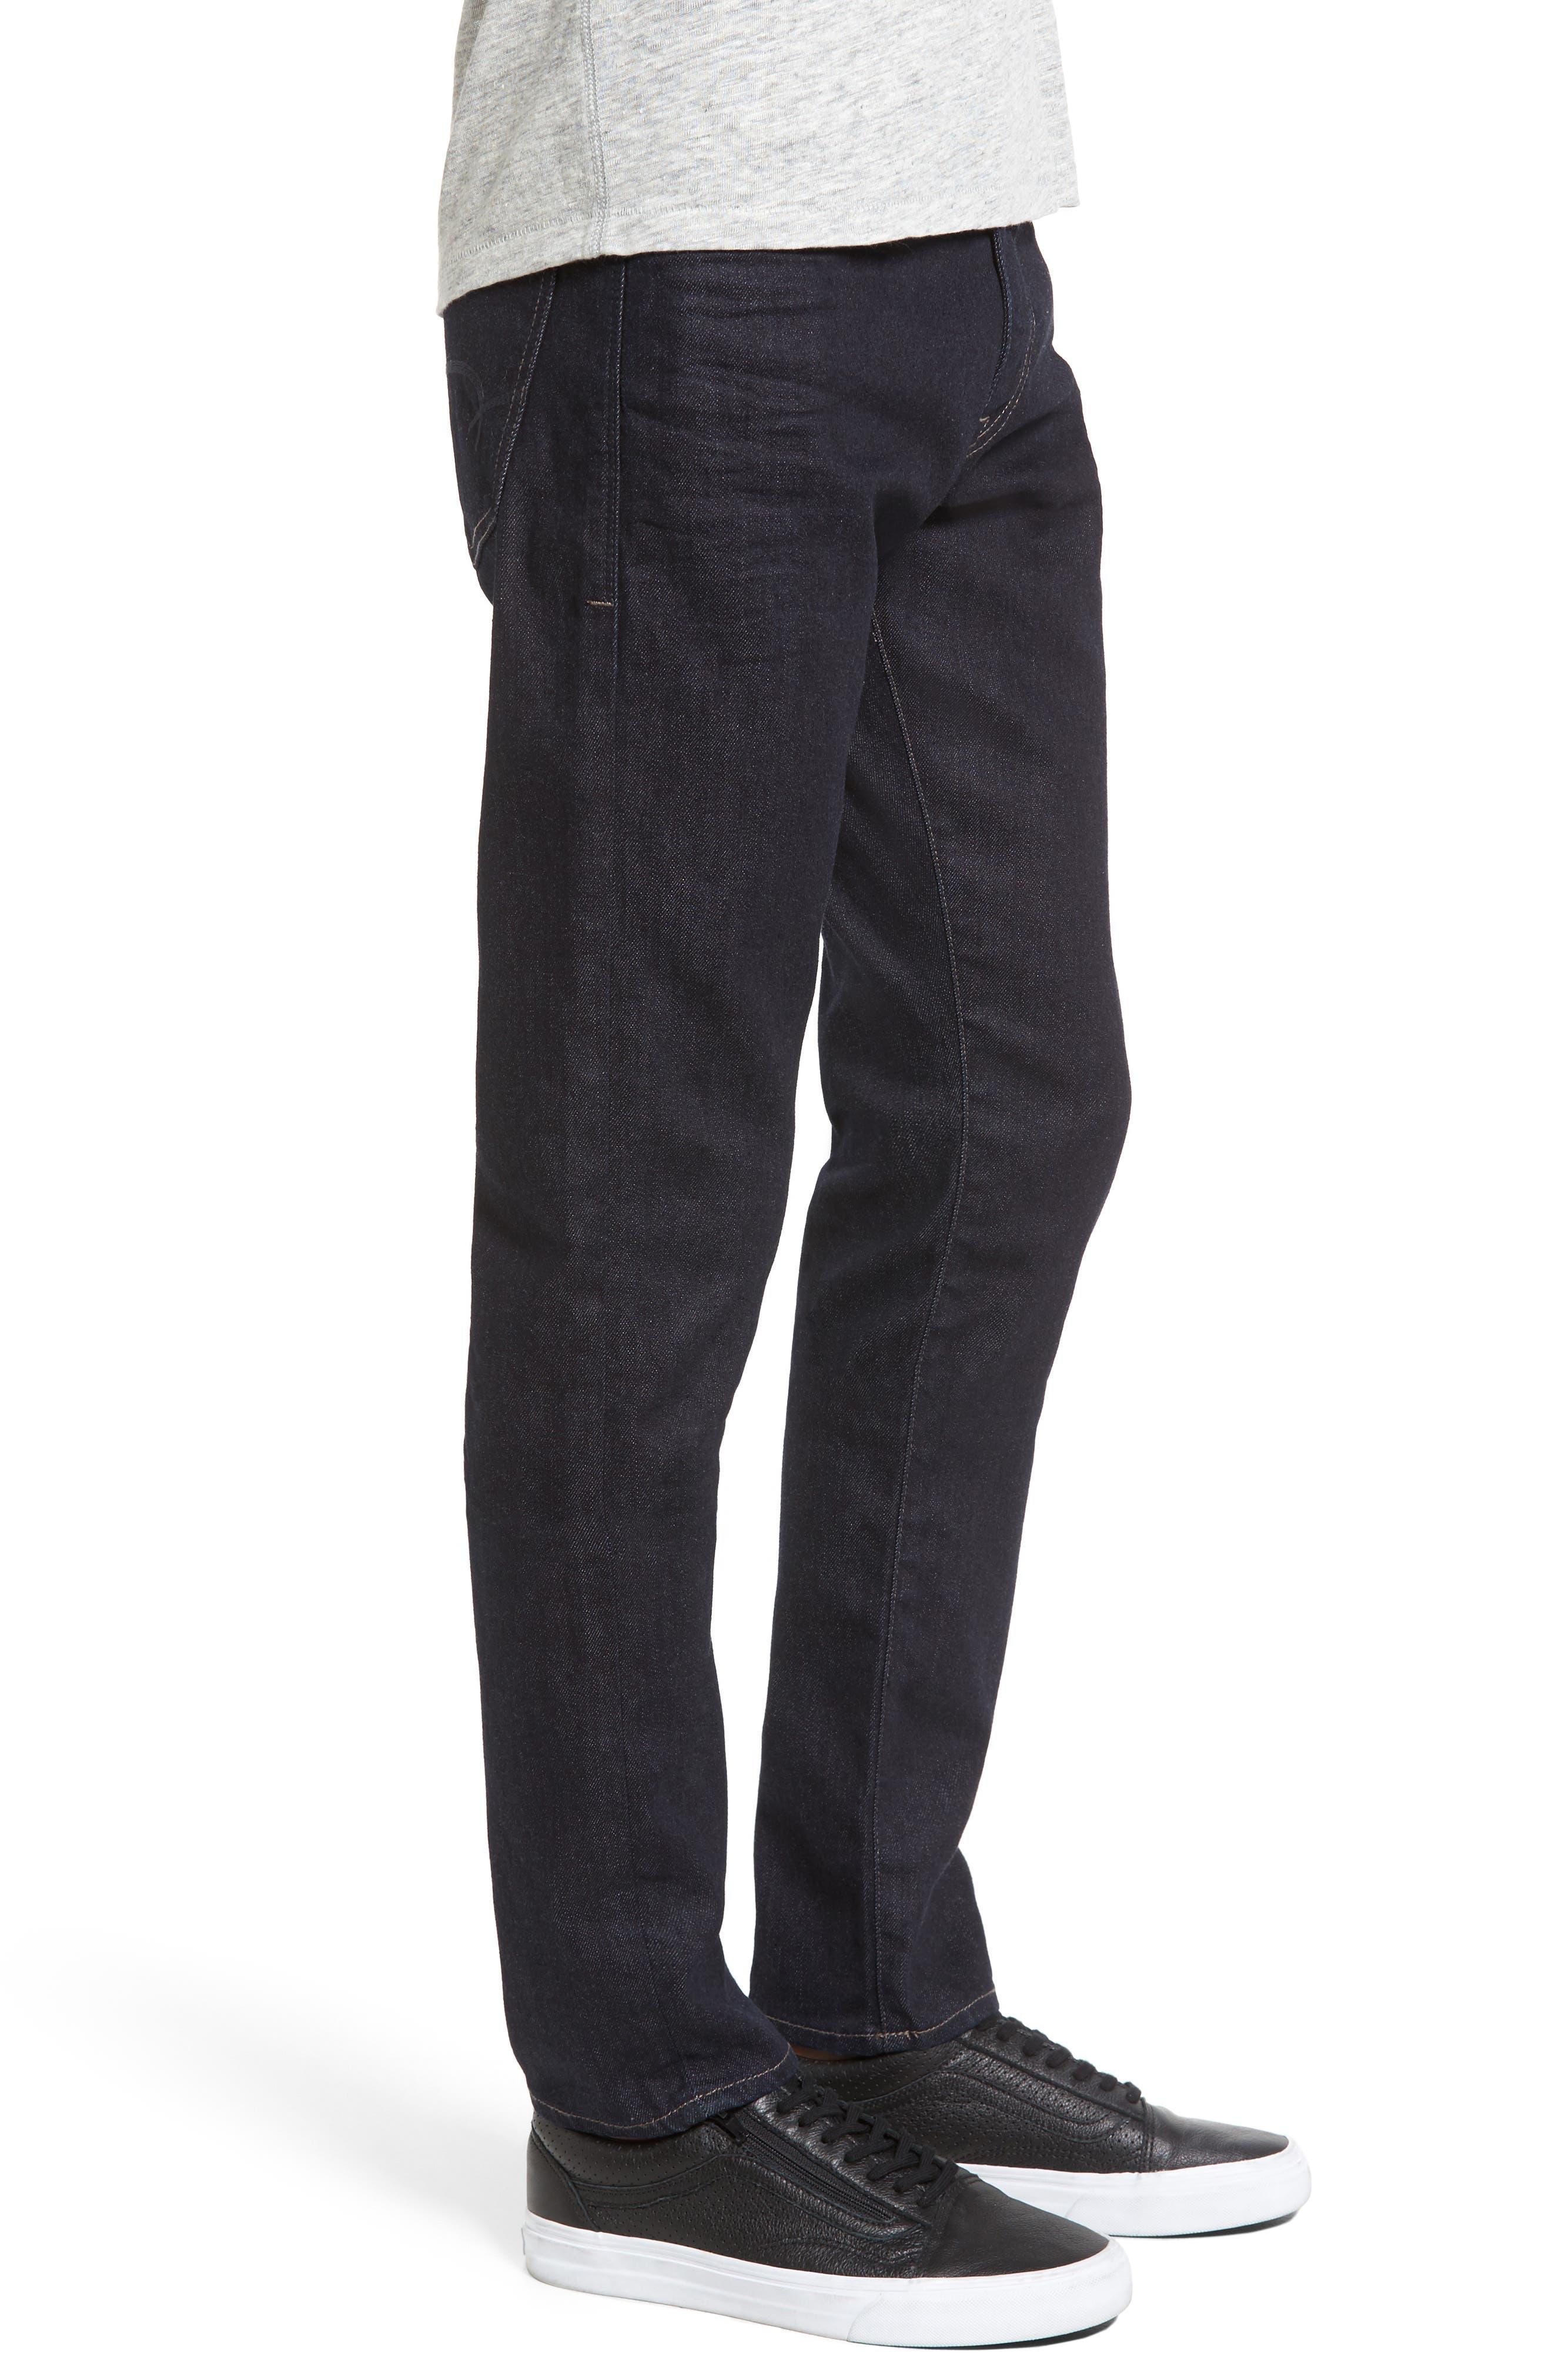 James Skinny Fit Jeans,                             Alternate thumbnail 3, color,                             Midnight Williamsburg